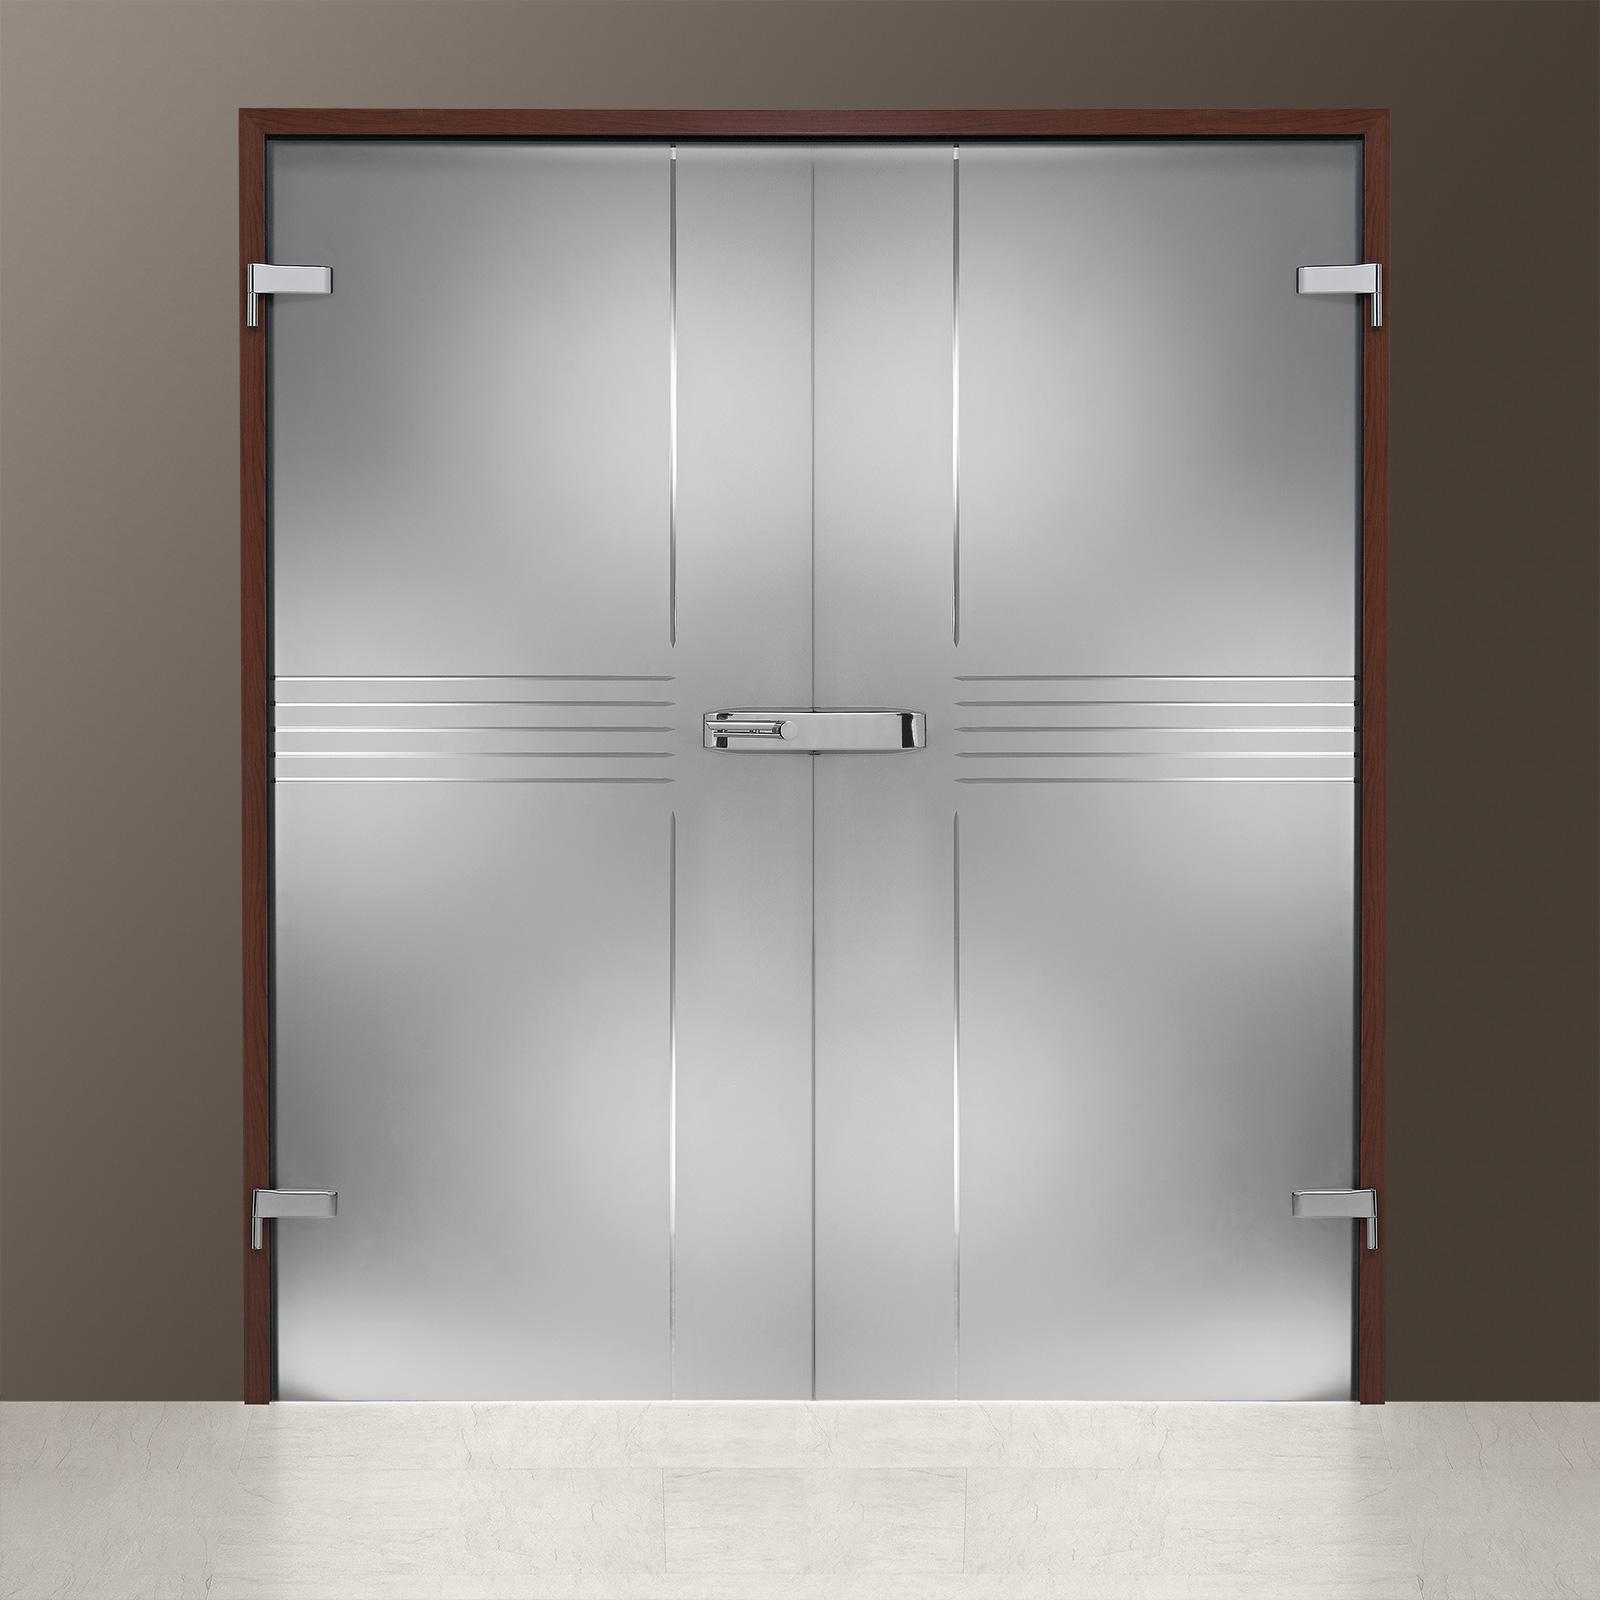 glast r 2 fl gel gtr 888 s satinato kristallrillenschliff junior studio bohrung ebay. Black Bedroom Furniture Sets. Home Design Ideas